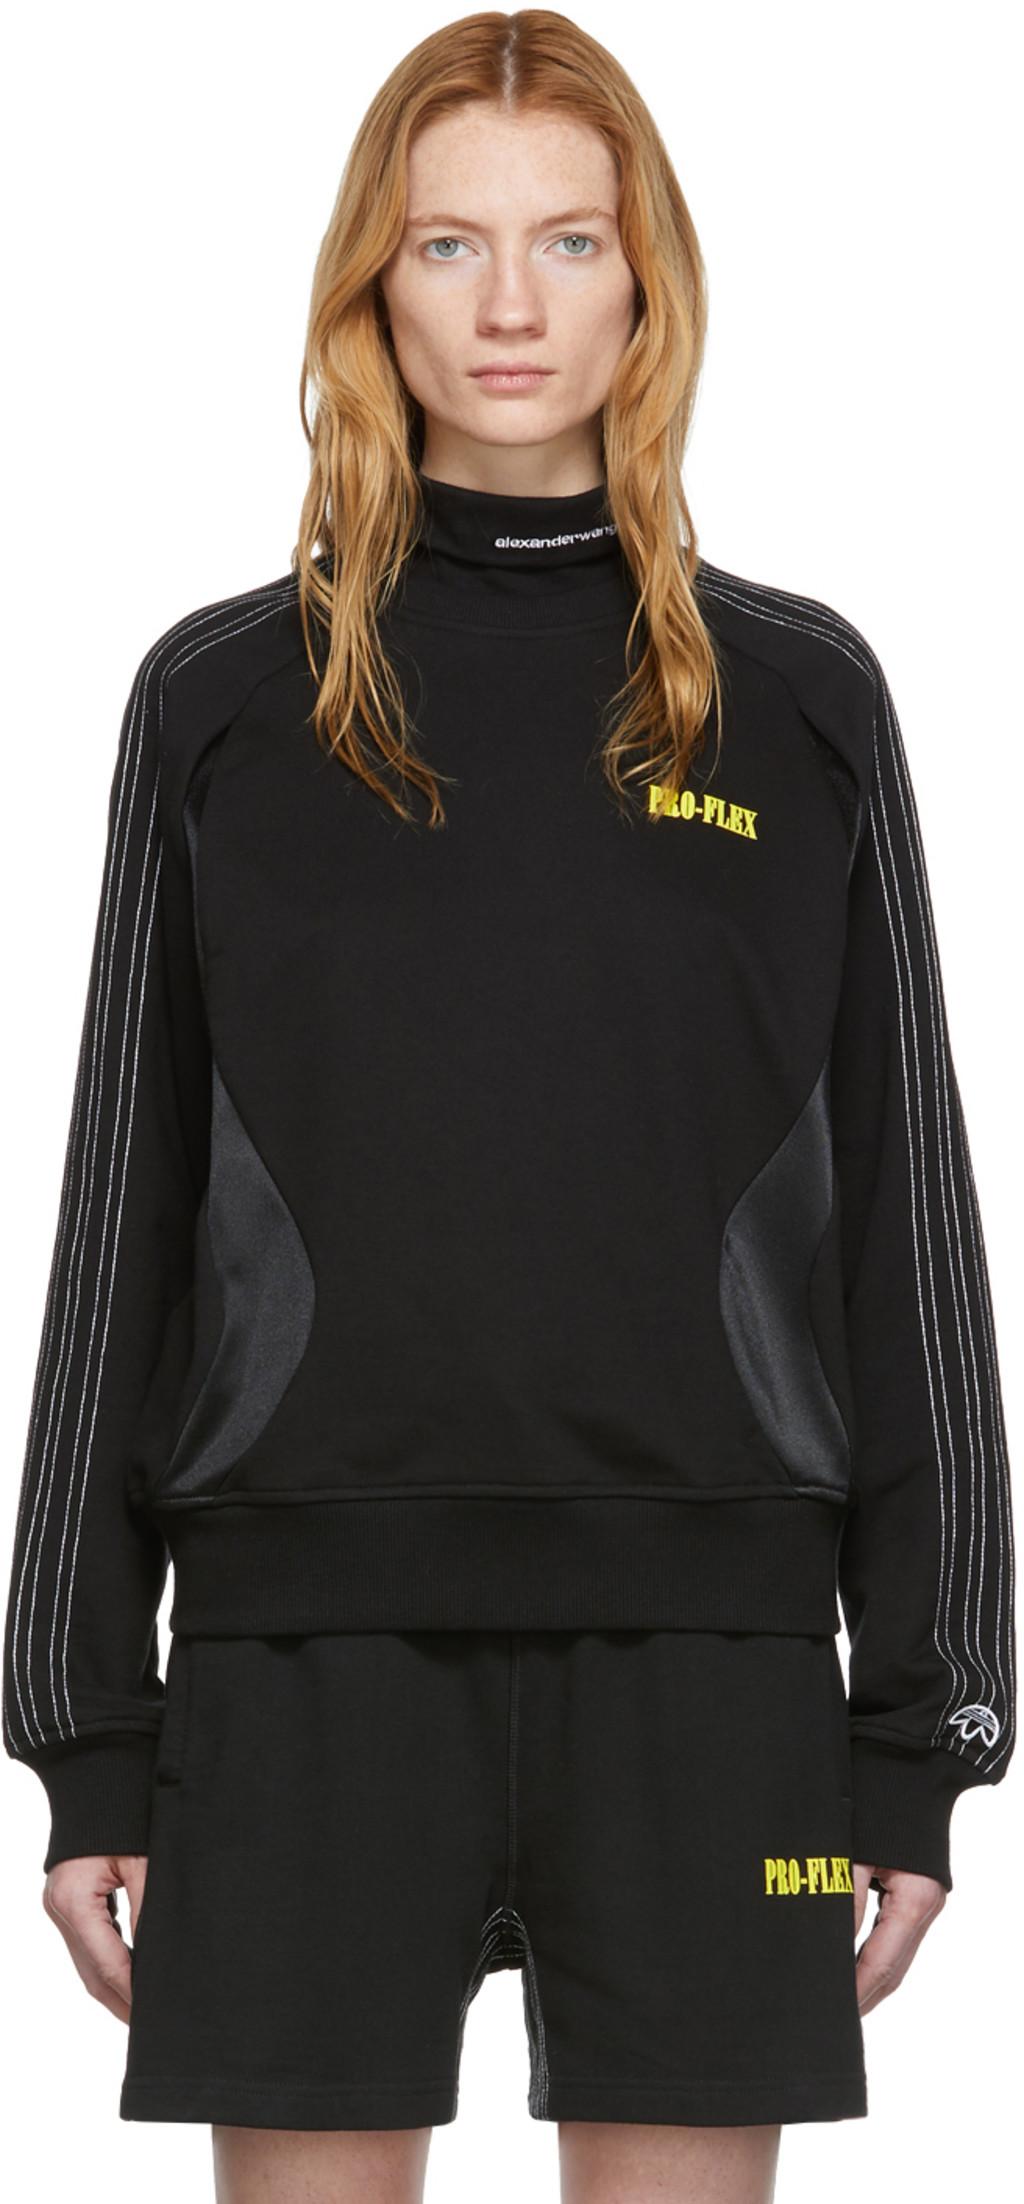 adidas Originals by Alexander Wang Crew Sweatshirt Black adidas Australia  adidas Australia